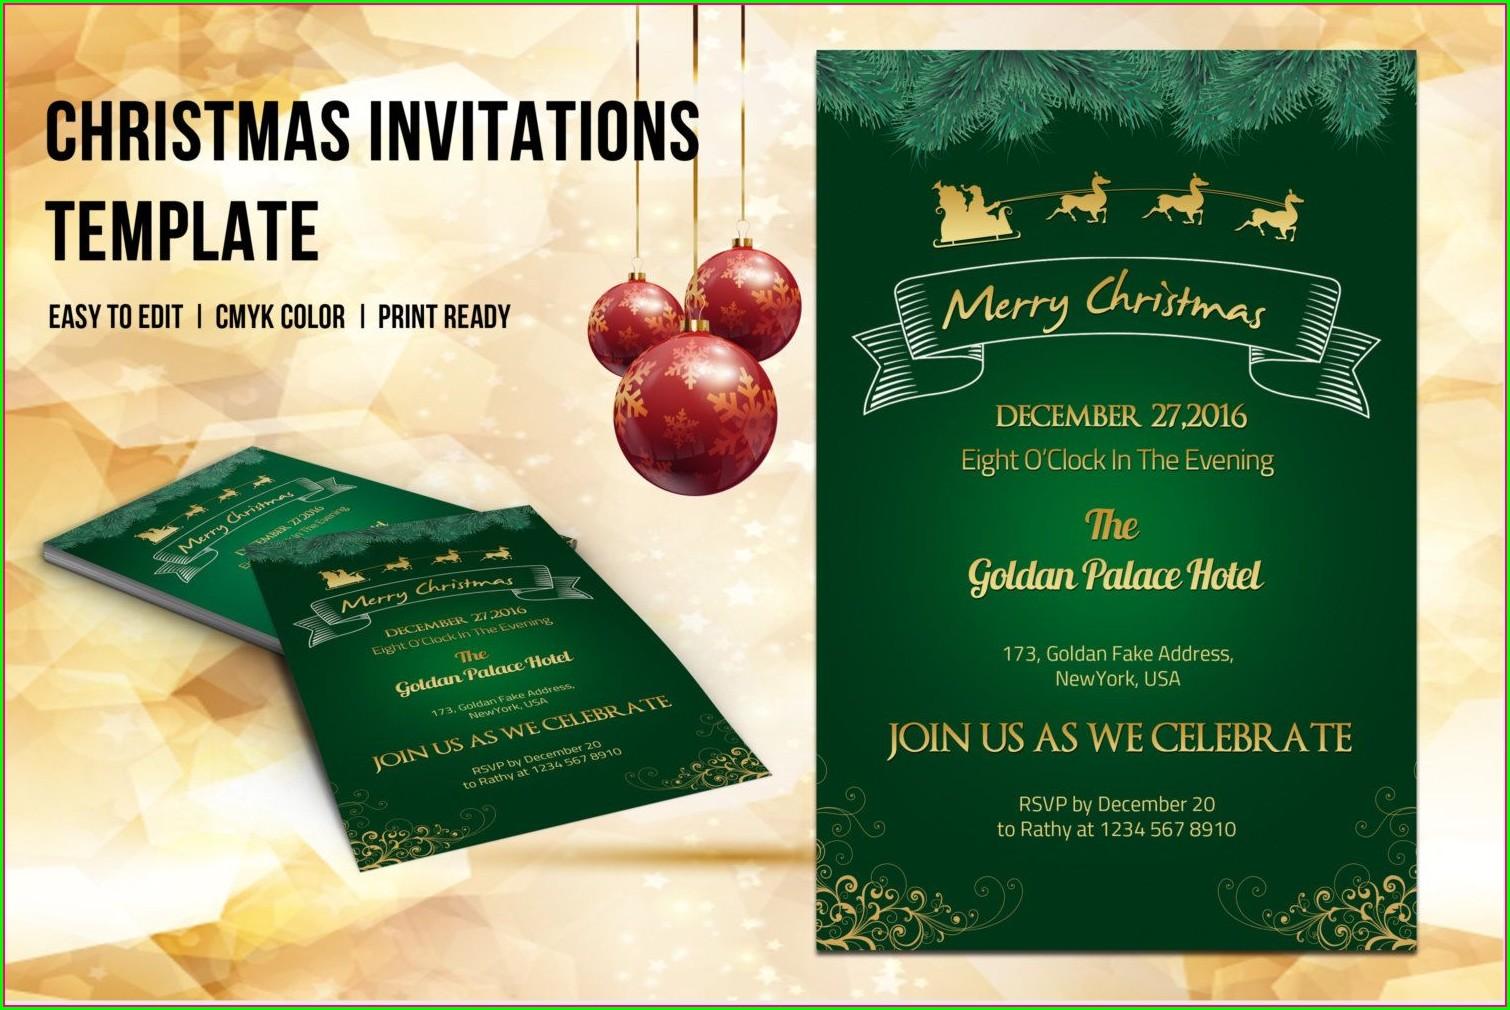 Invitation Flyer Template Word